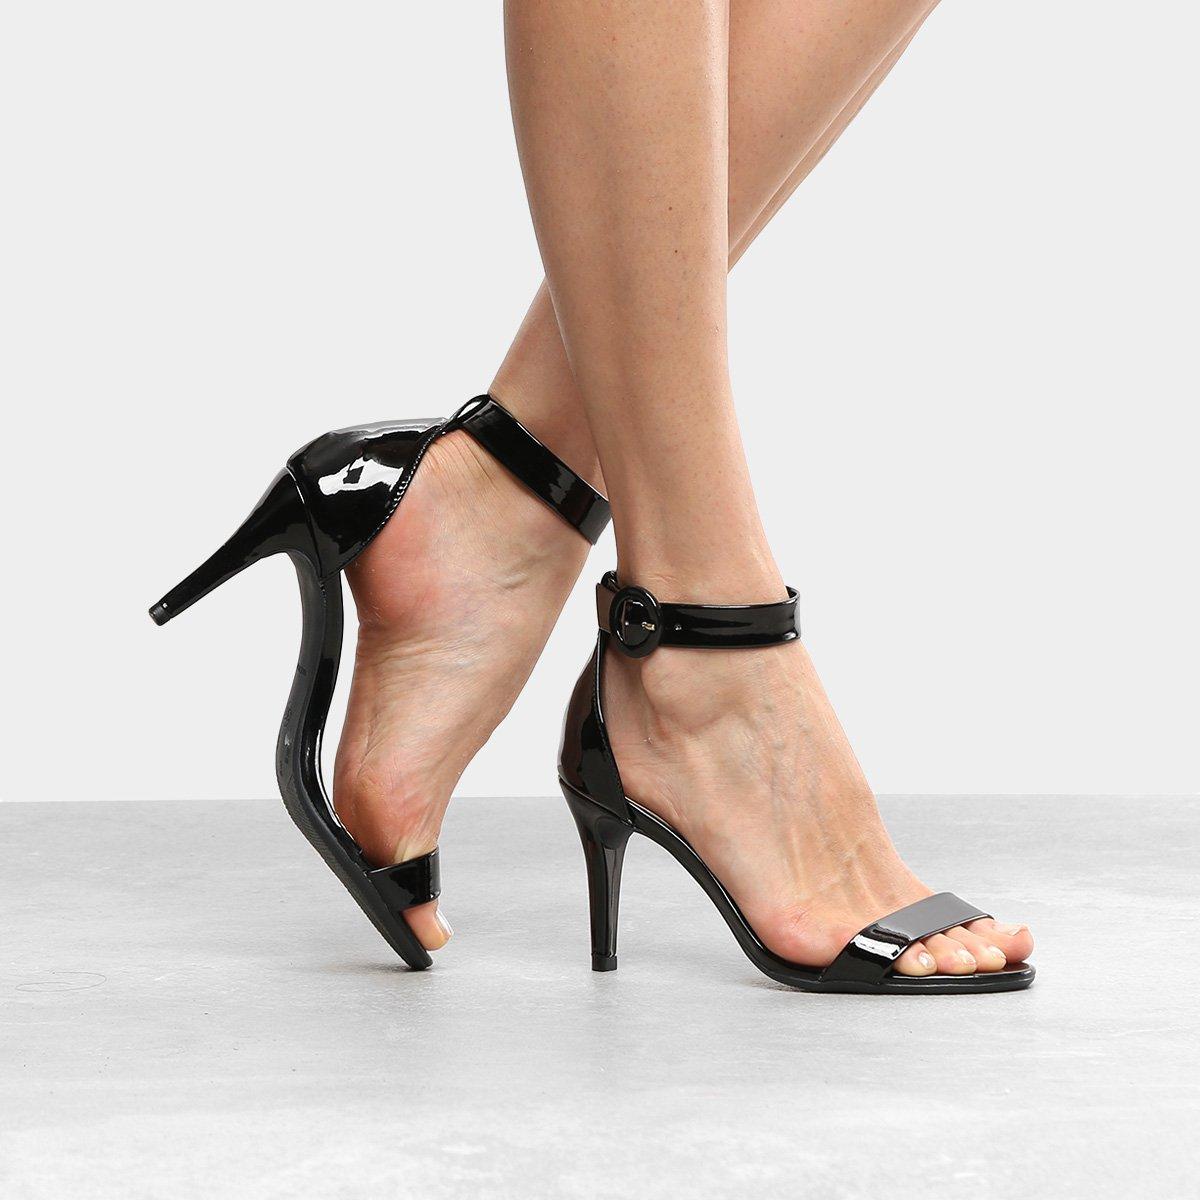 db3789aeee Sandália Drezzup Salto Fino Ankle Strap Feminina